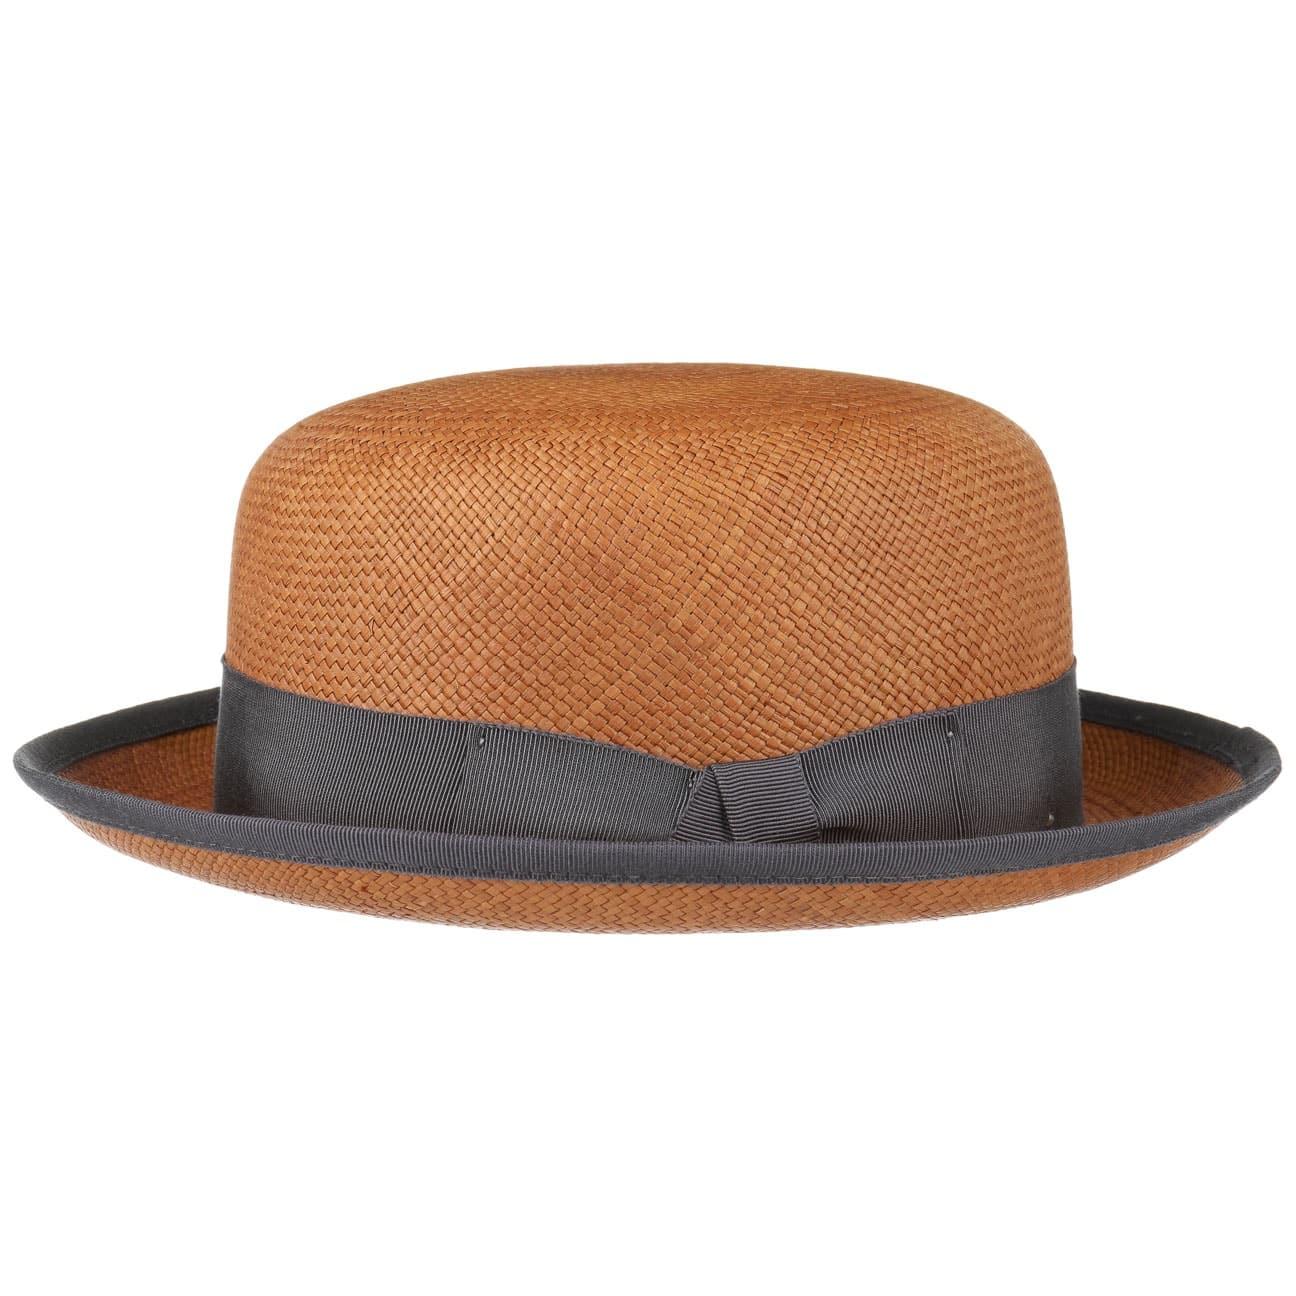 Chapeau Chaplin by Bailey of Hollywood  chapeau